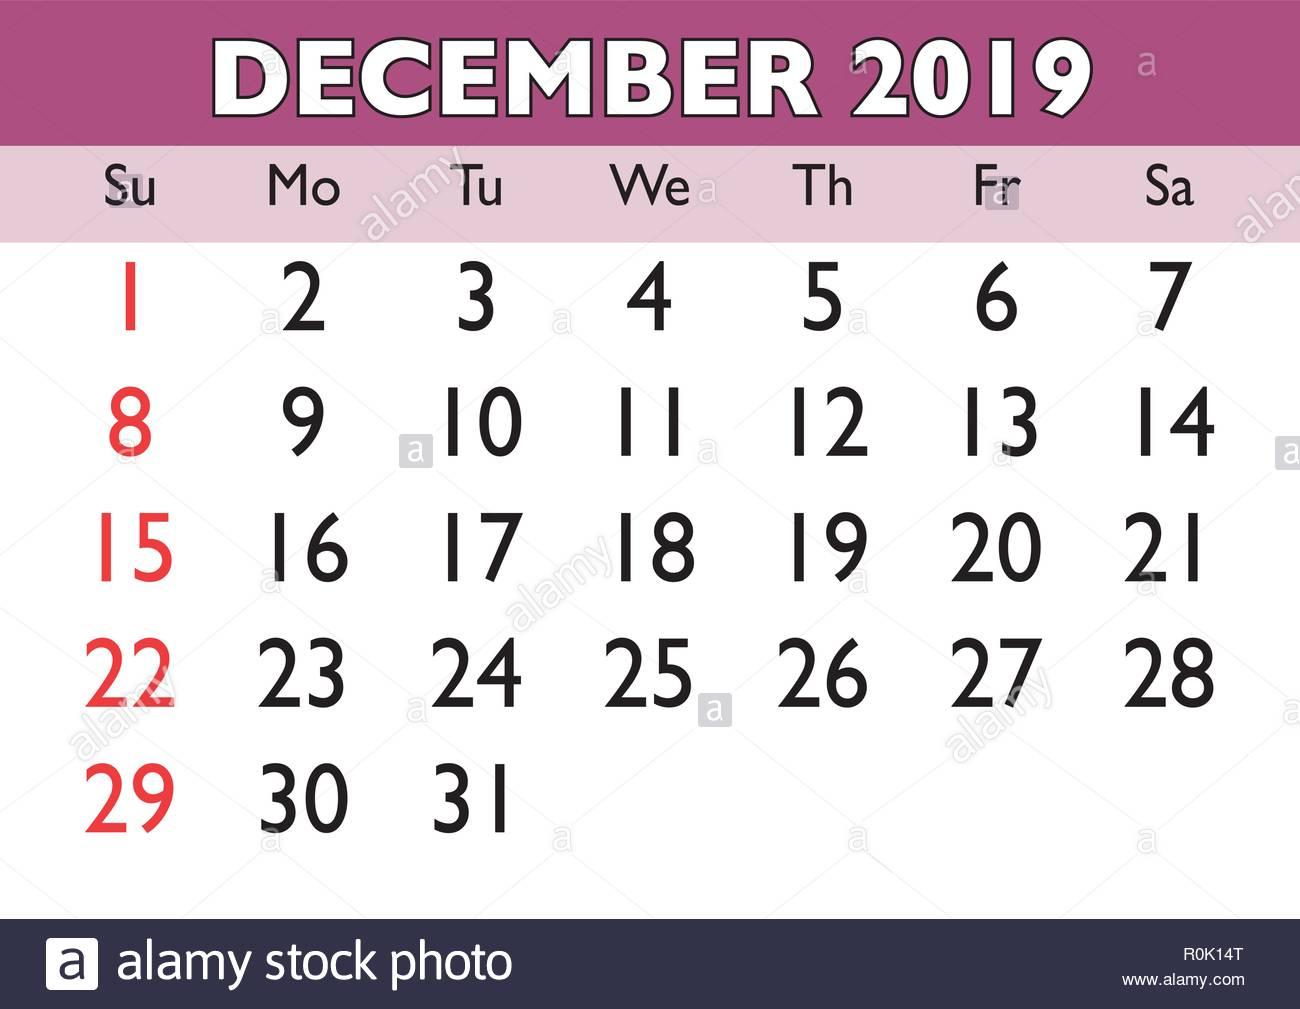 Calendario Dicembre 2019 Stampabile.2019 Calendario Mese Di Dicembre Vettore Calendario